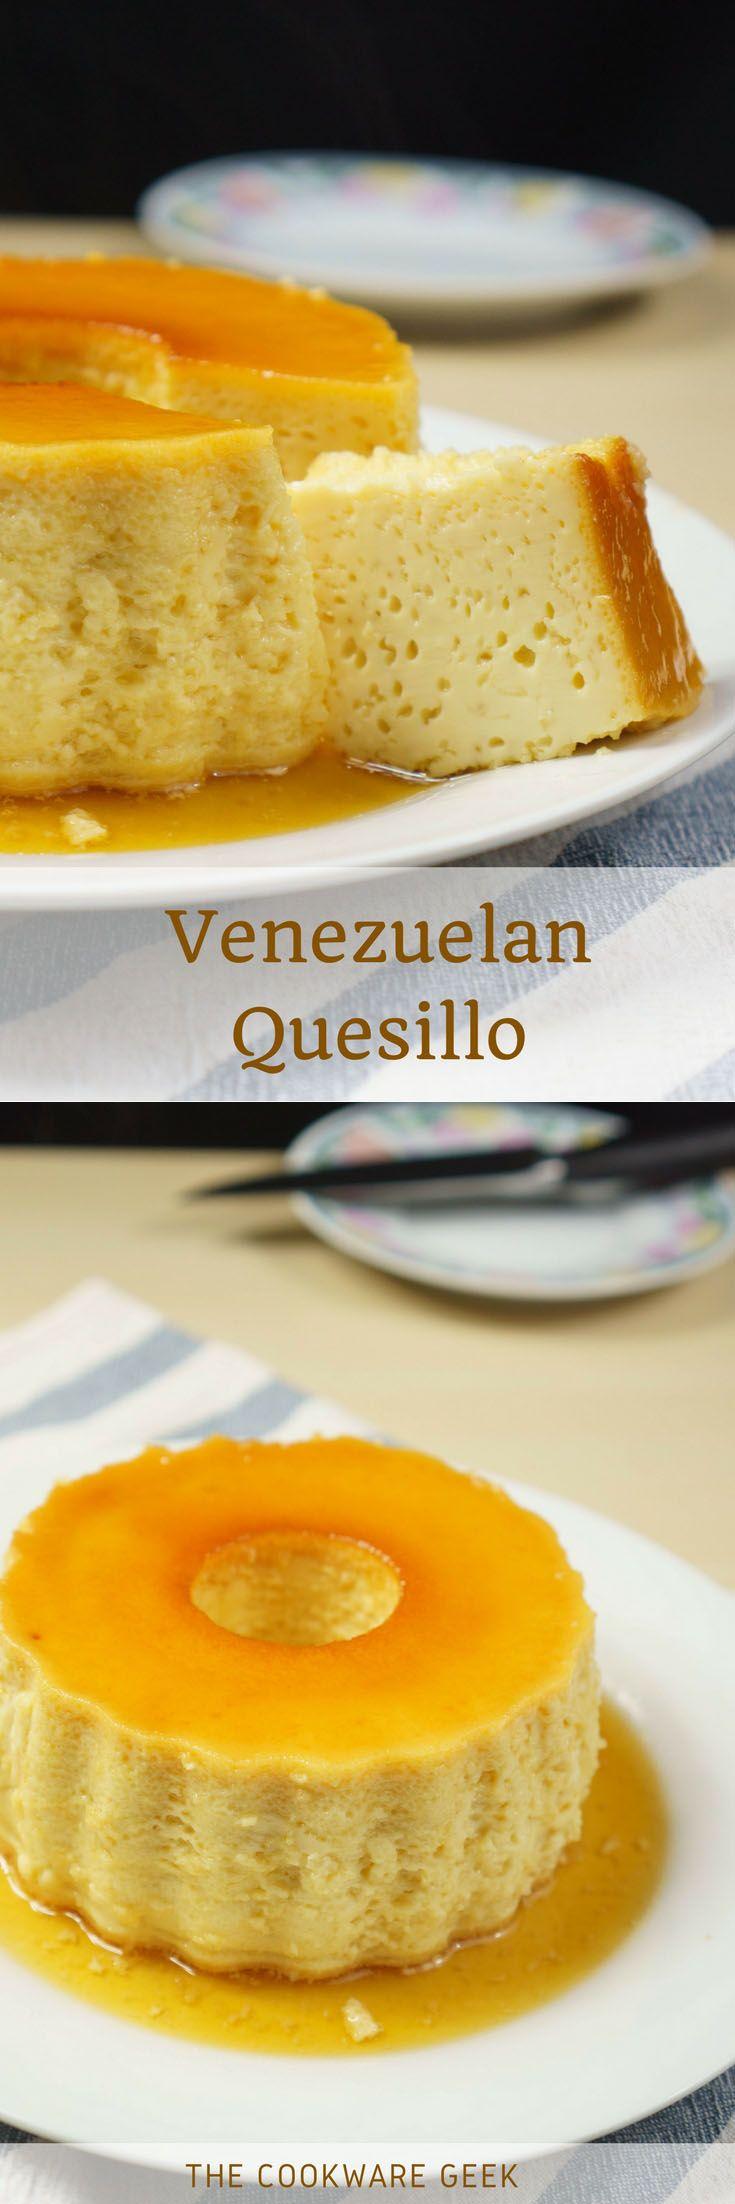 Venezuelan Quesillo (pudding) #dessert #Venezuela #quesillo | The Cookware Geek